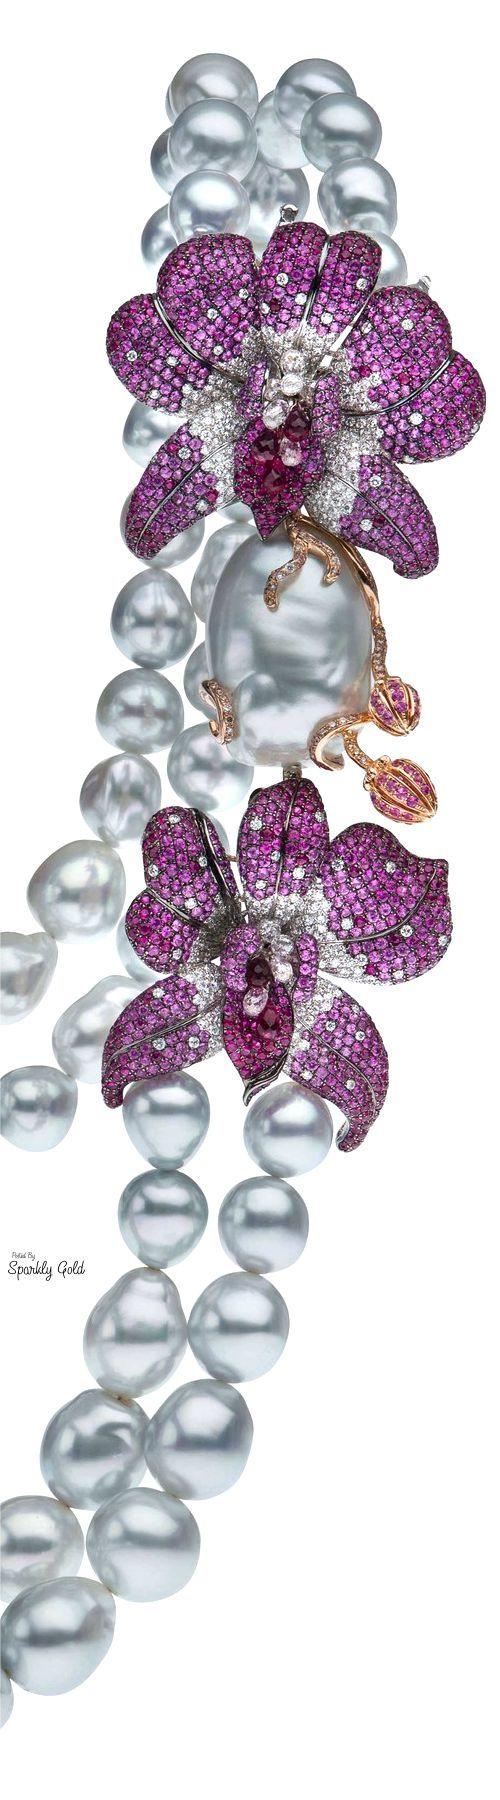 Rosamaria G Frangini | High Pearl Jewellery | Autore